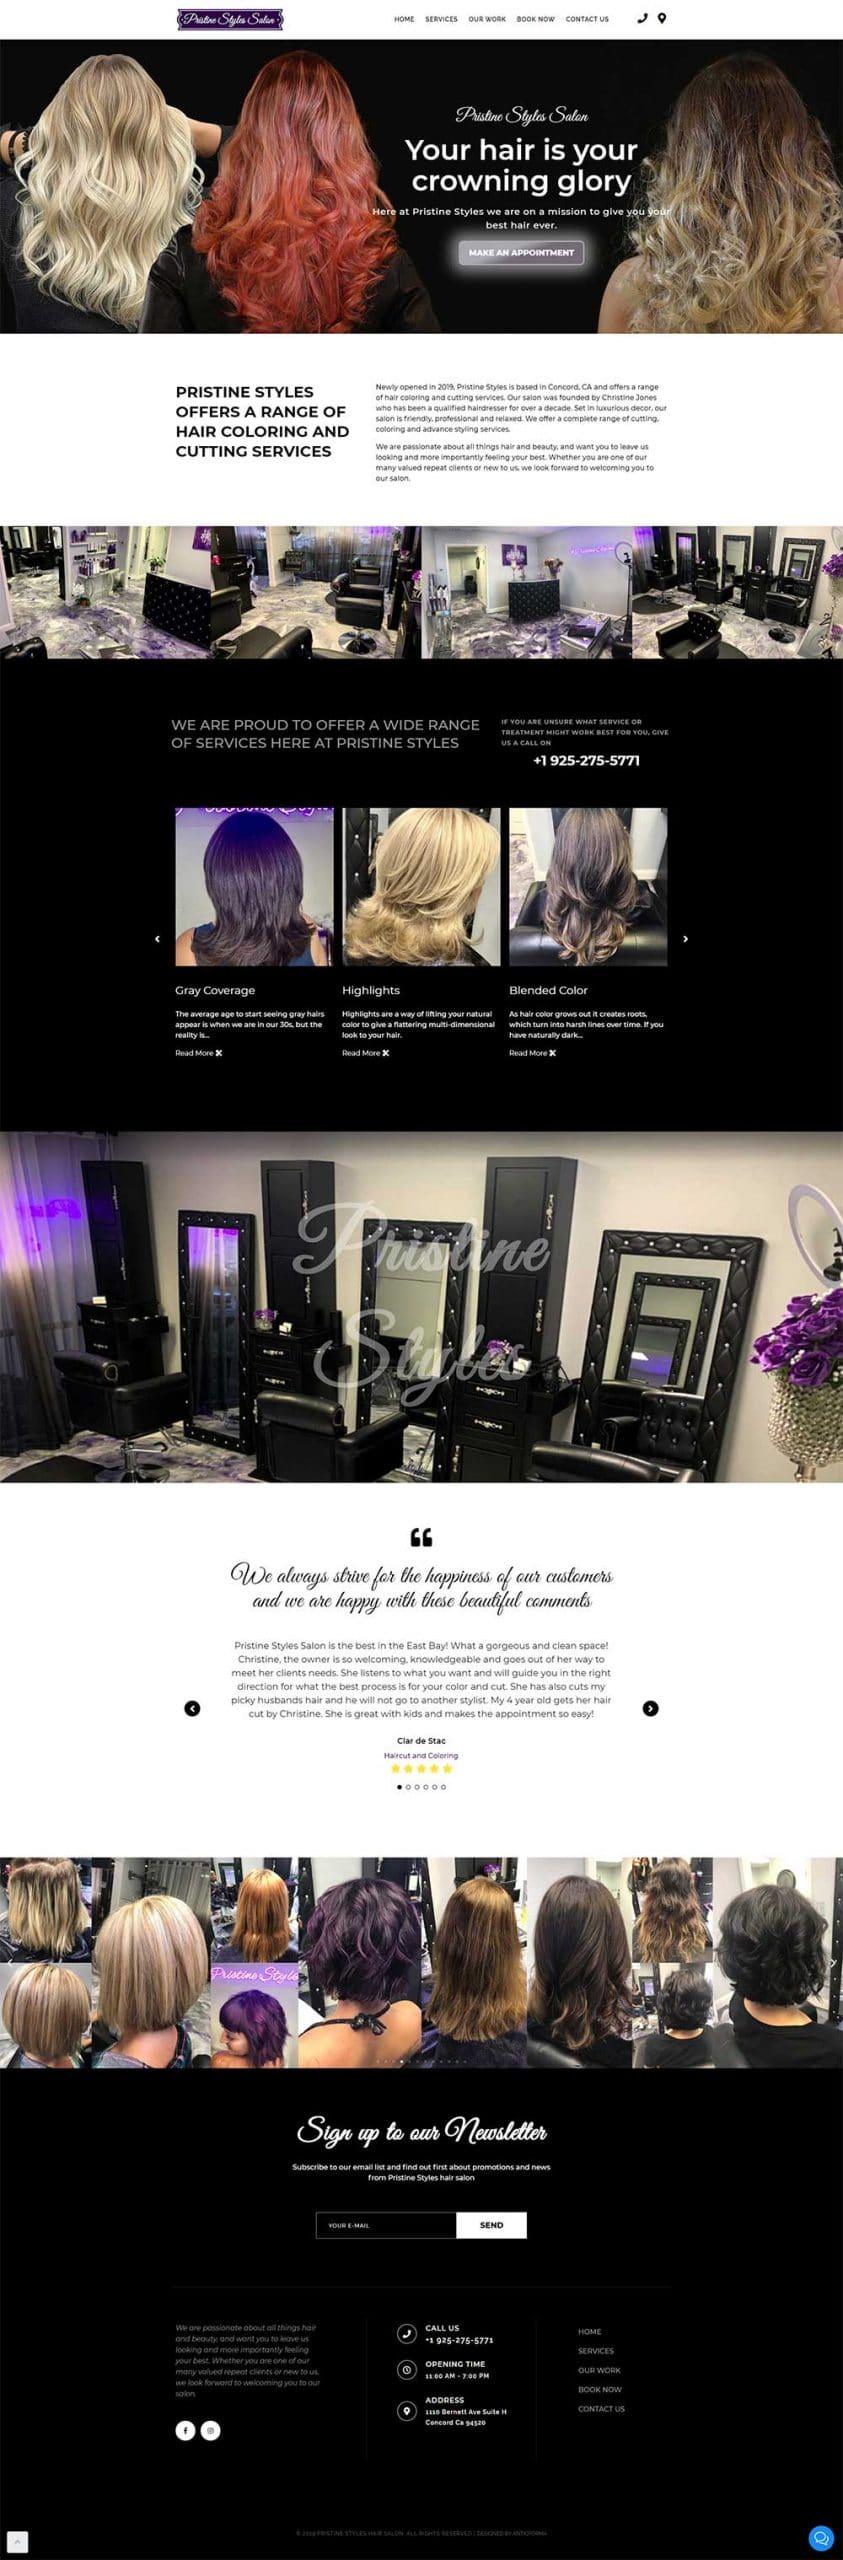 Pristine Styles website screenshot